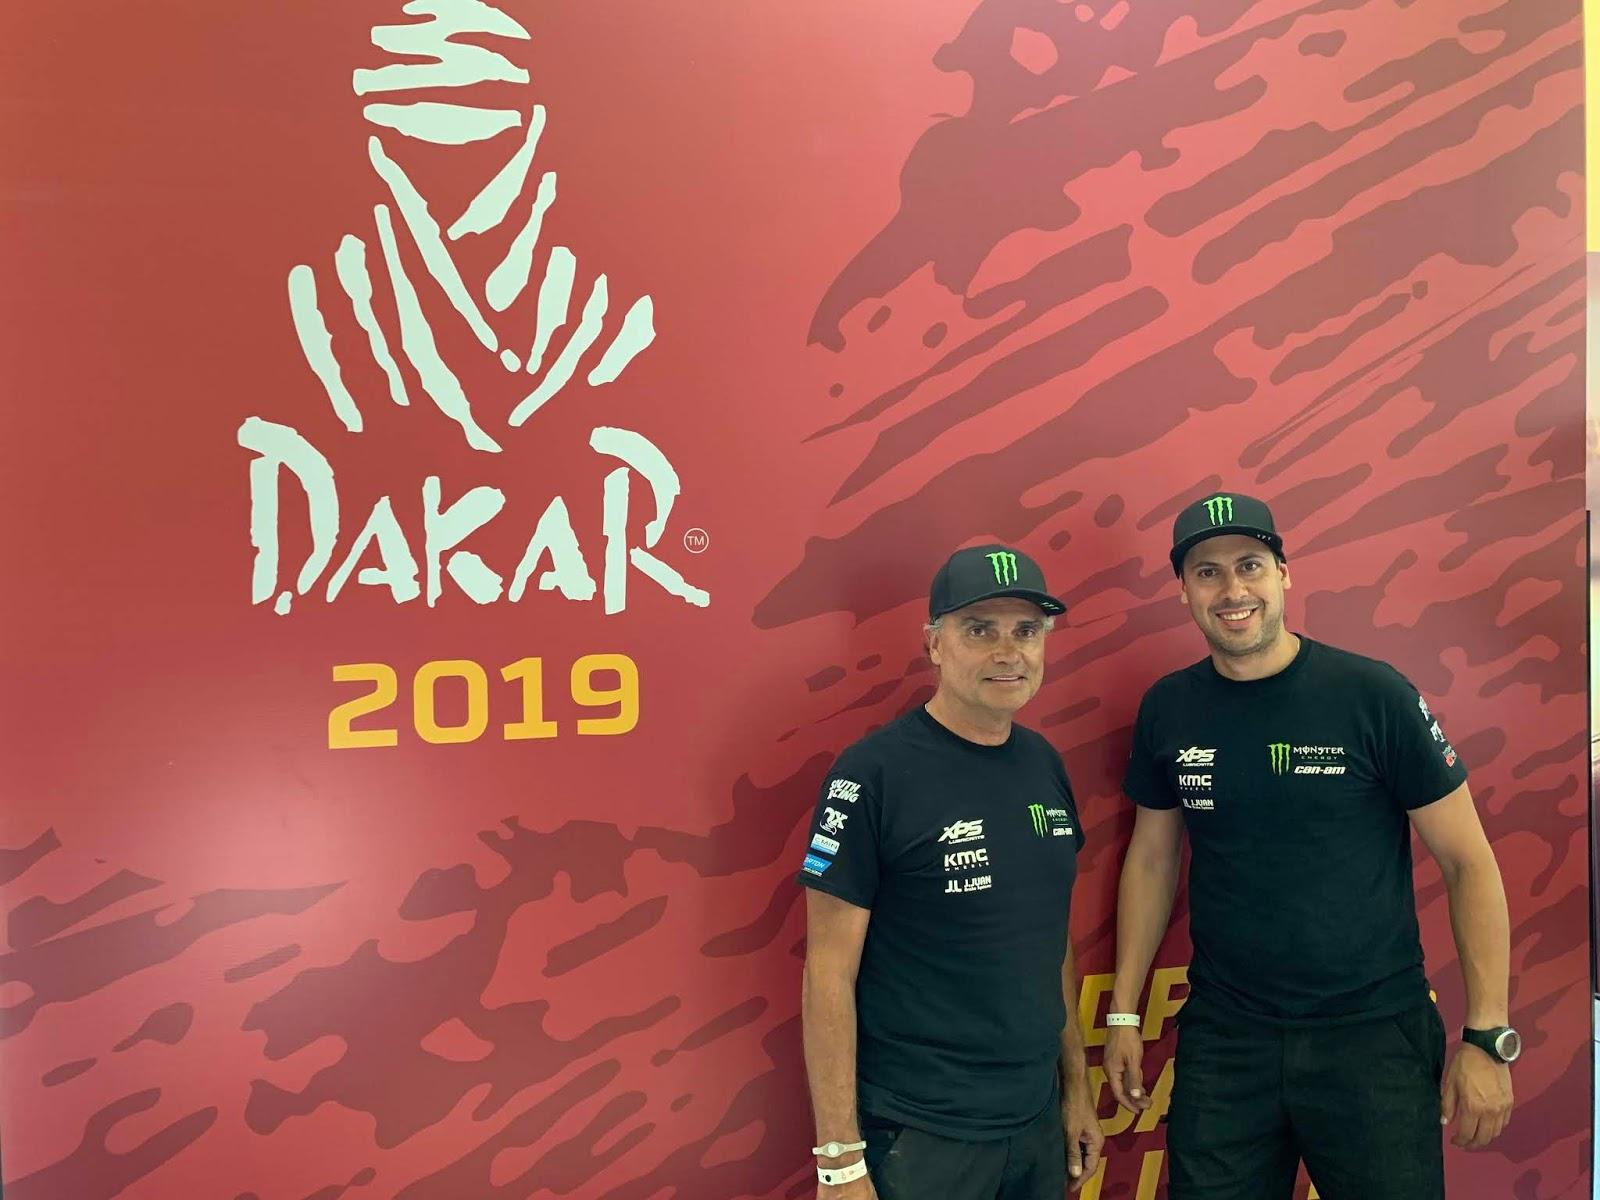 f438fa2b9f Dada largada no Rally Dakar 2019